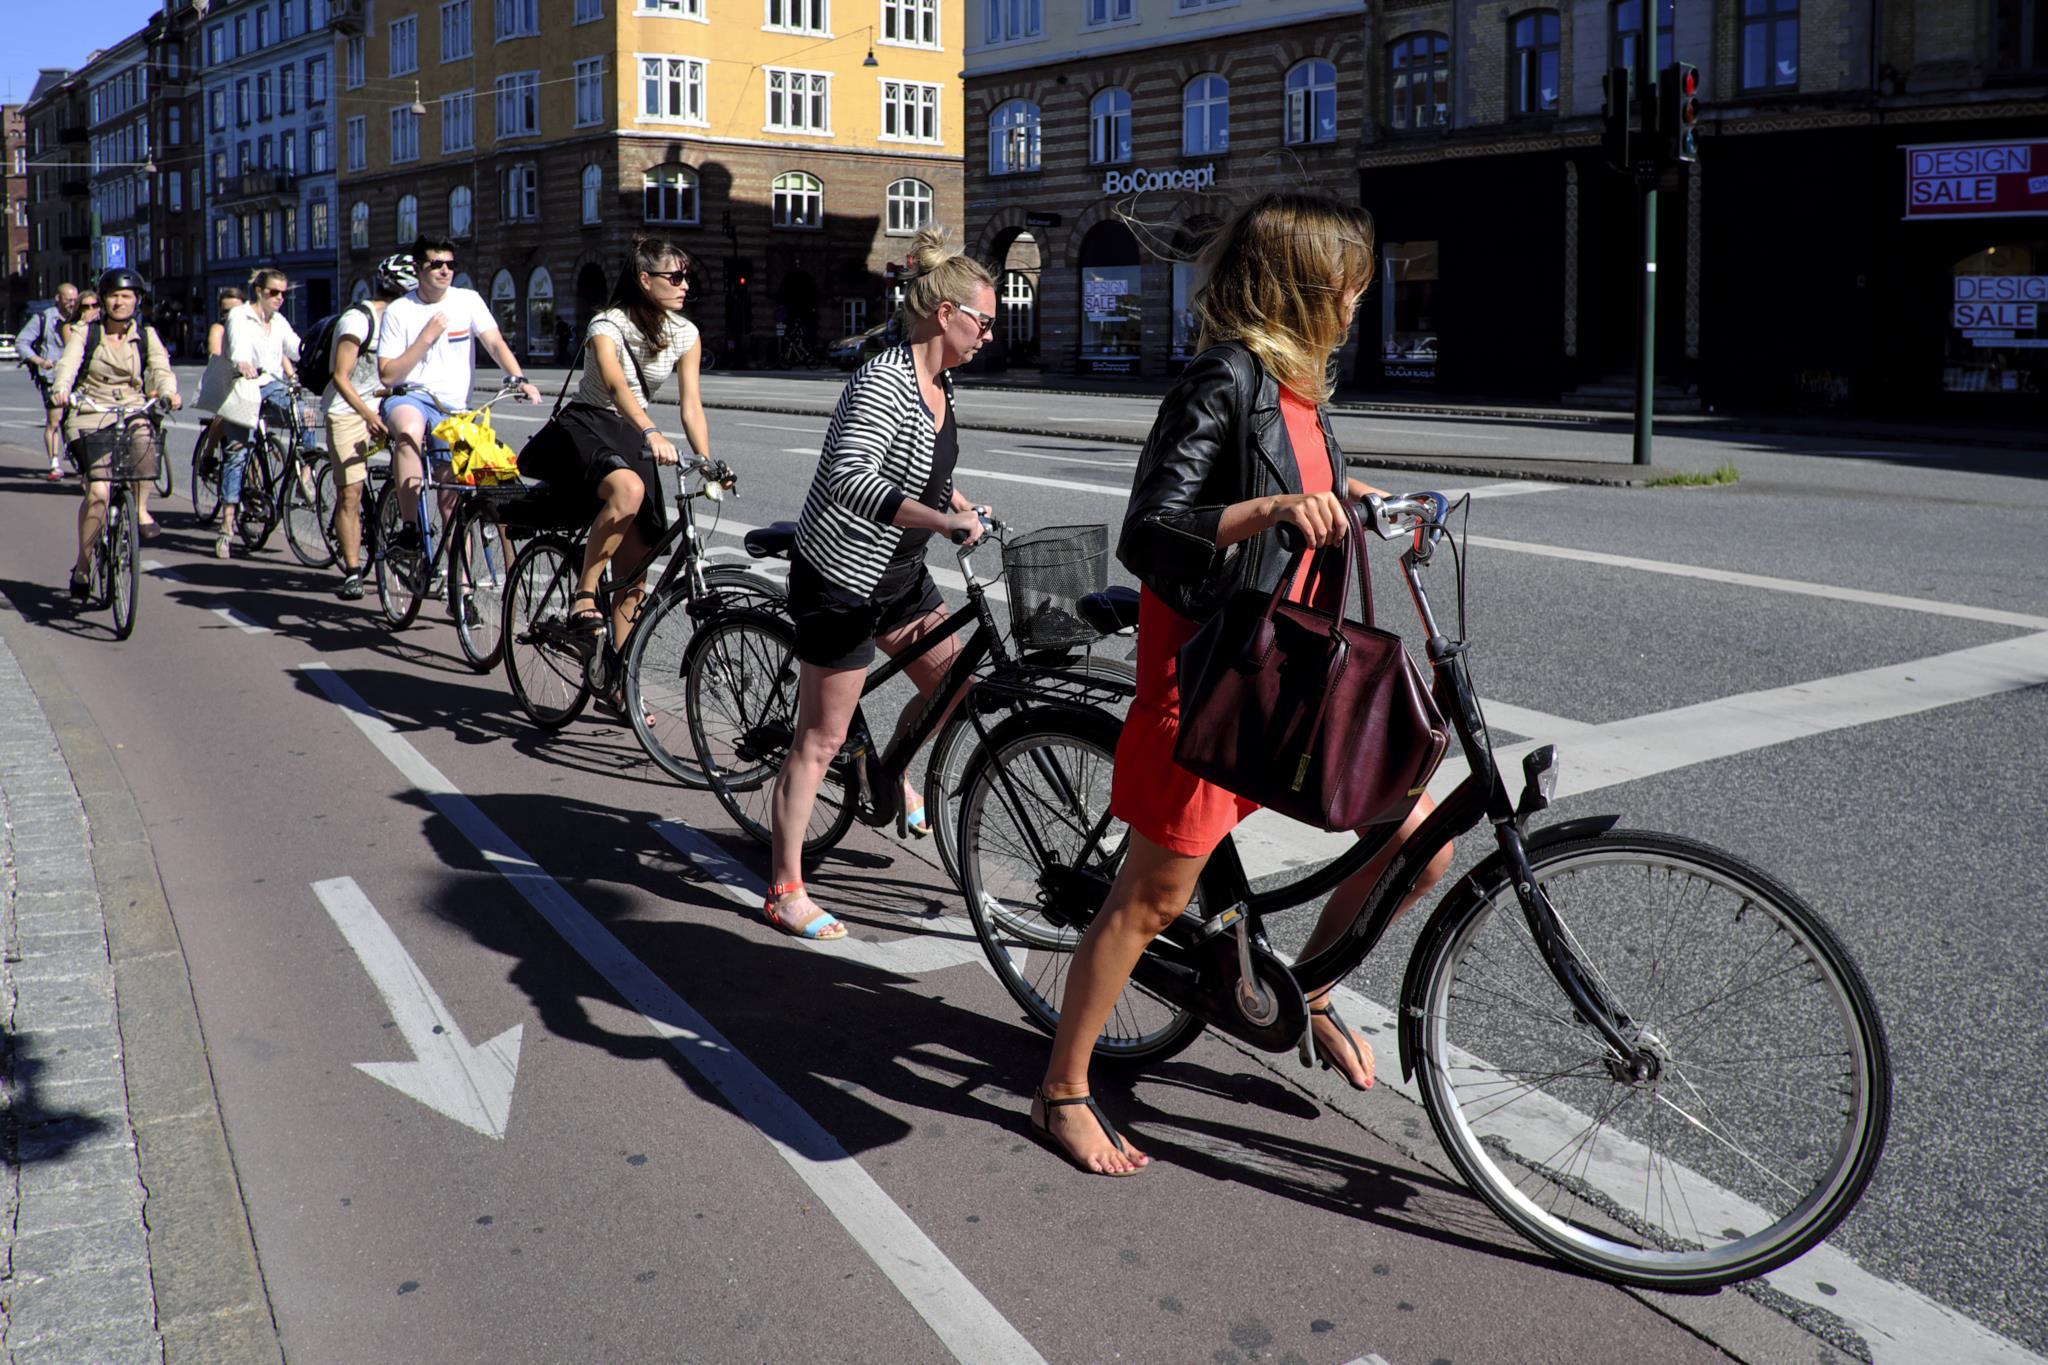 Nos últimos 20 anos, o tráfego de bicicletas aumentou 68% na Dinamarca